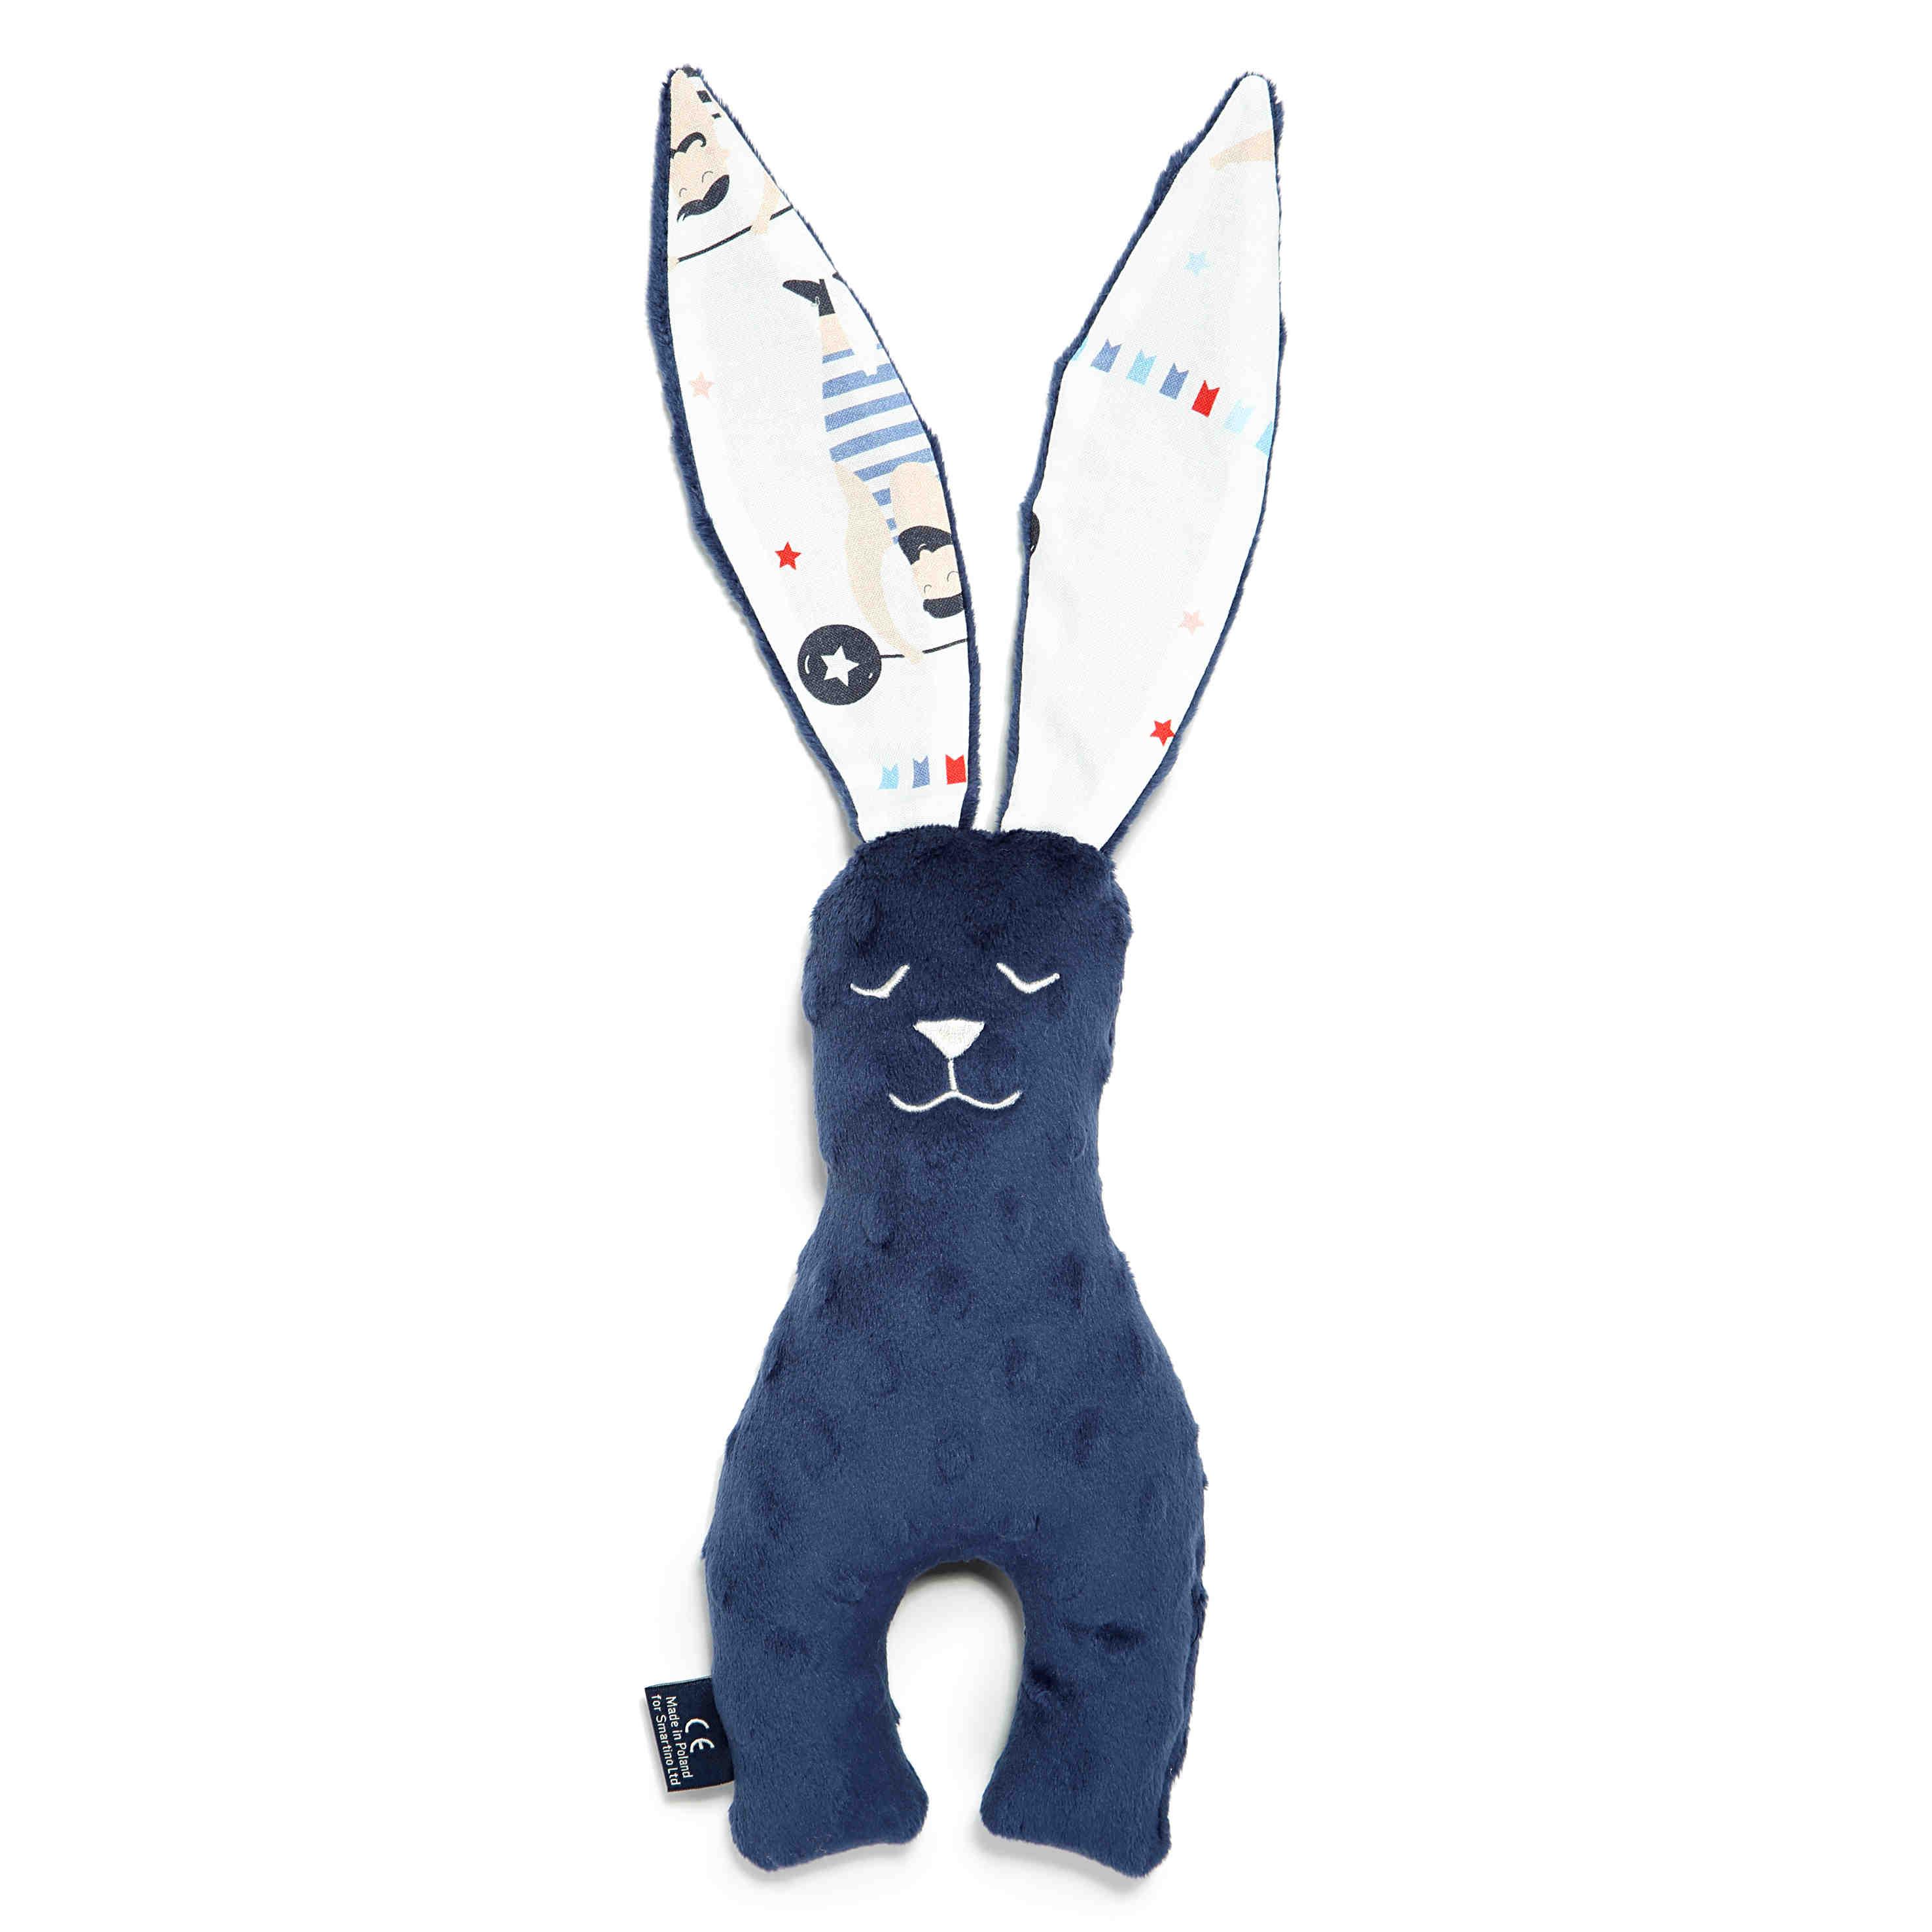 64693cf83f6 La Millou Small Bunny Navy Circus Strongmen Υφασμάτινο Παιχνίδι Λαγουδάκι,  1 τεμάχιο